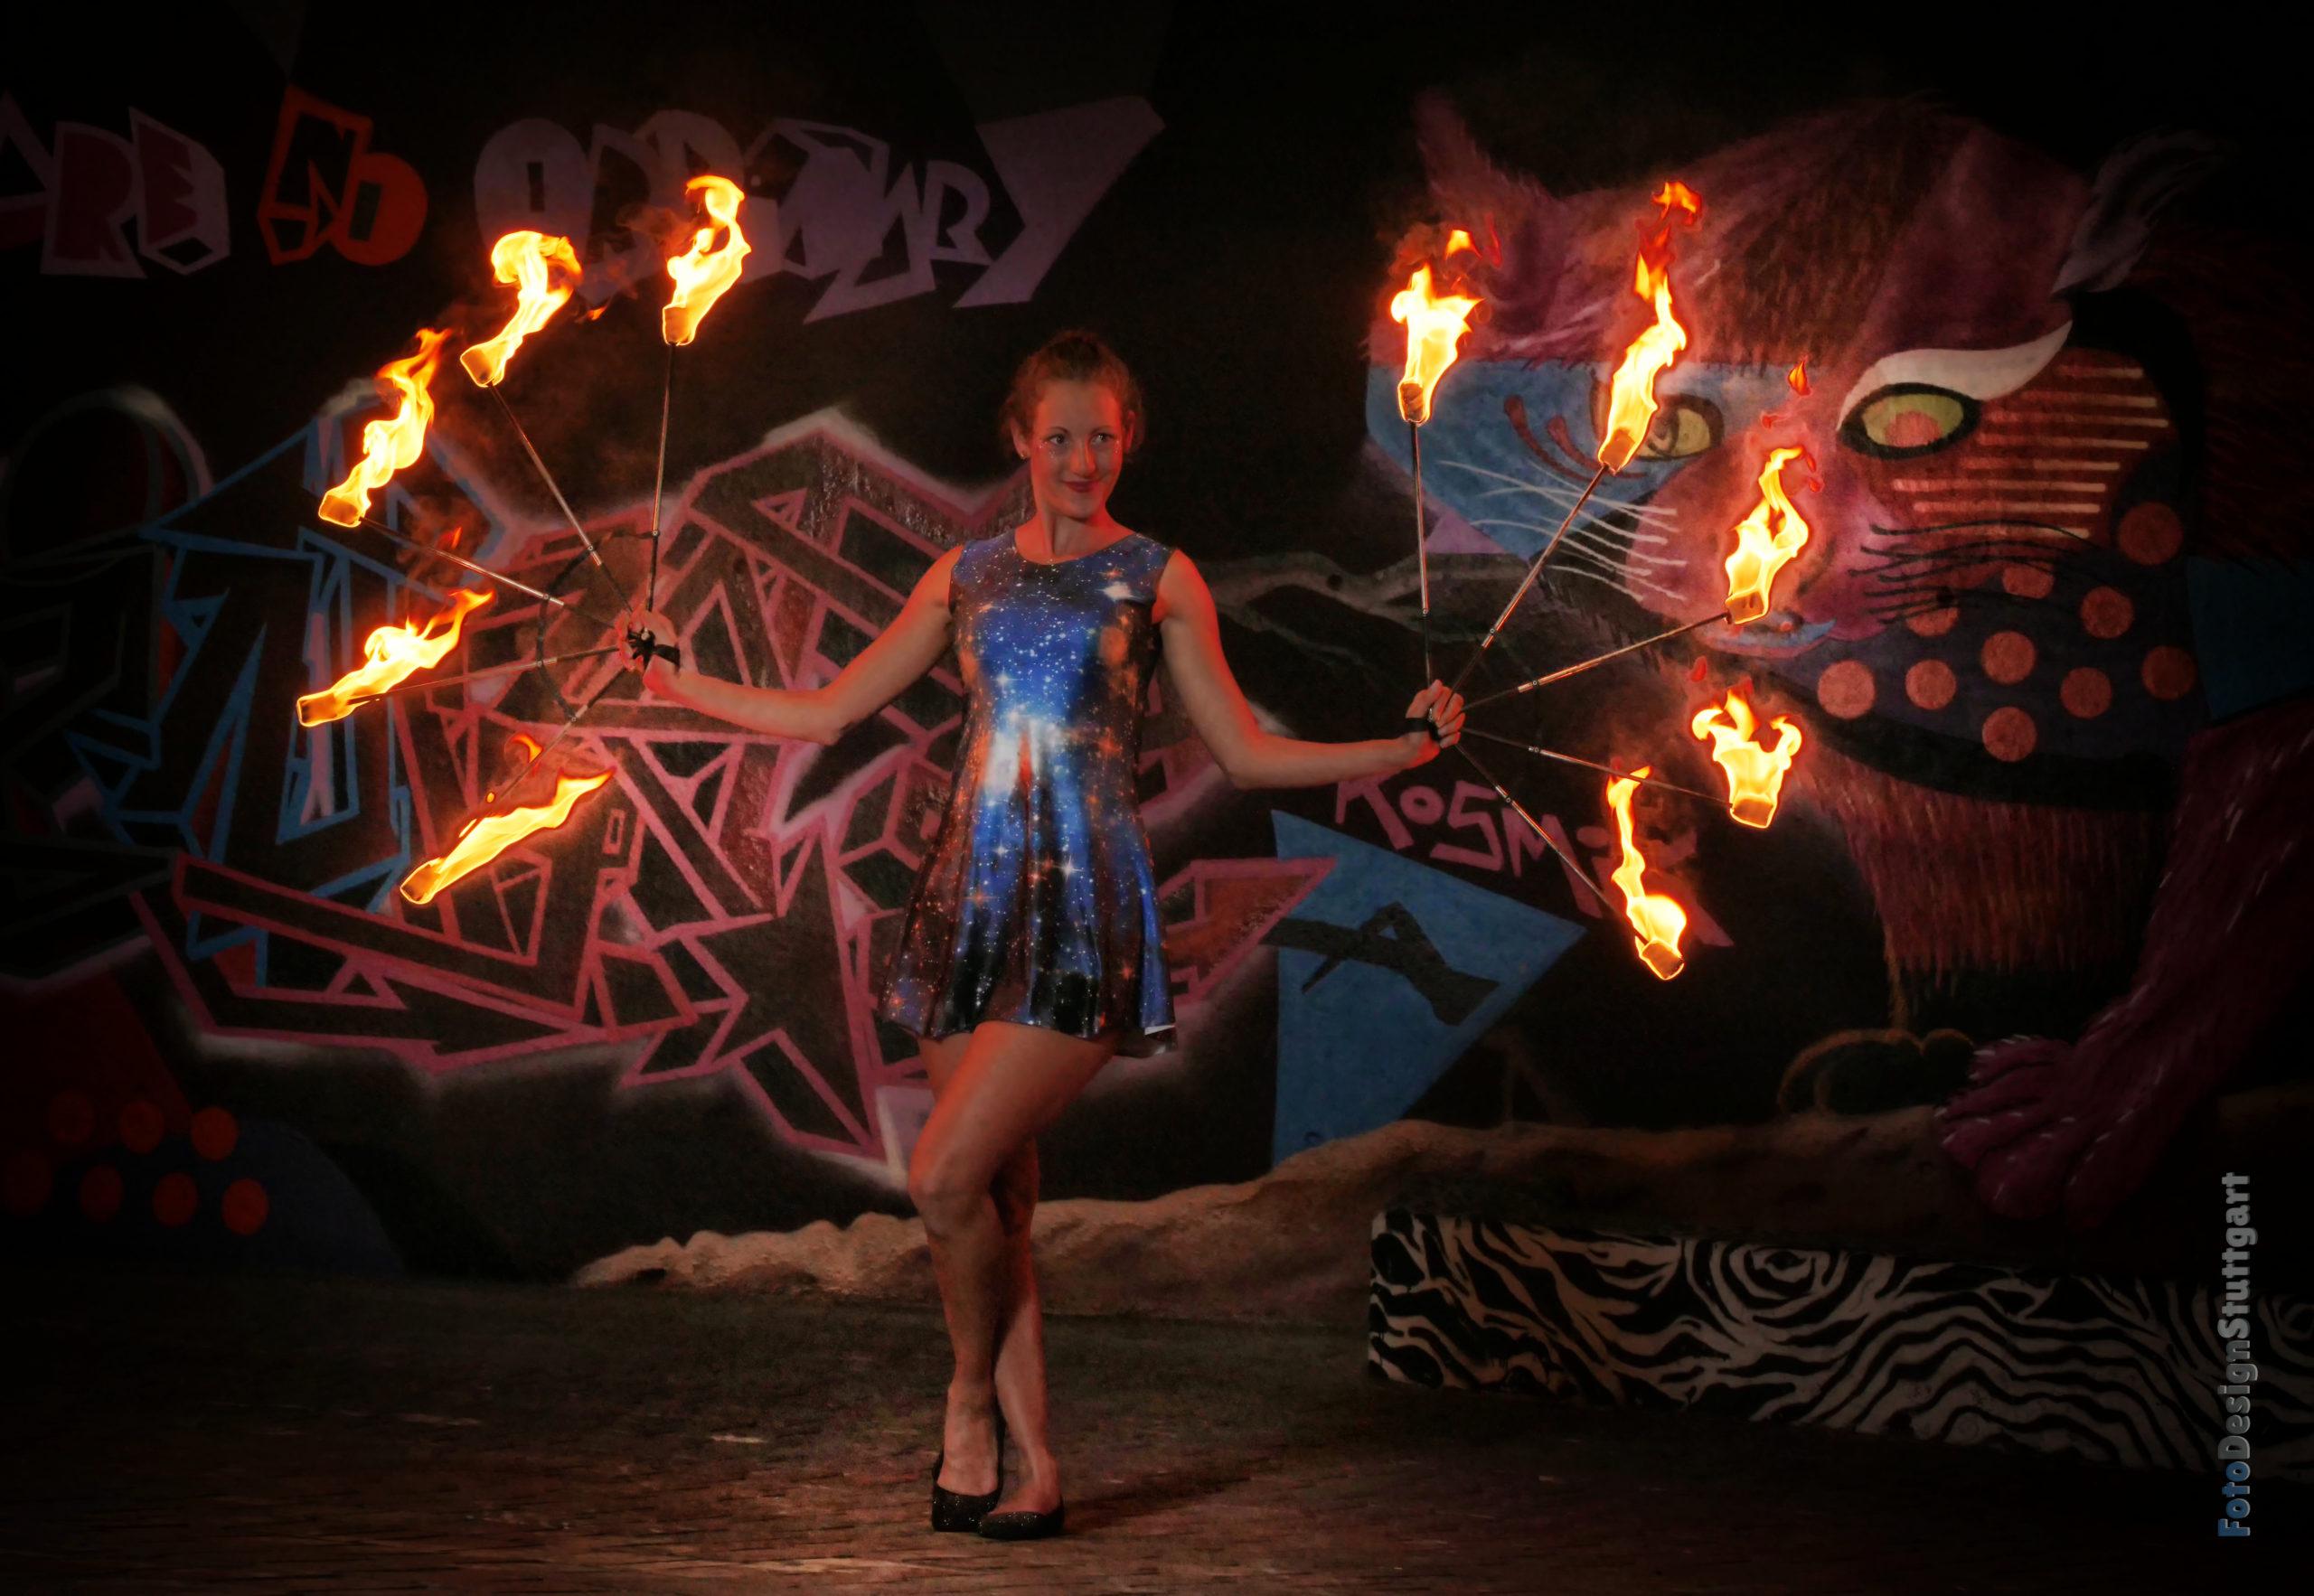 flamazing Feuershow Showvarianten Feuerfächer